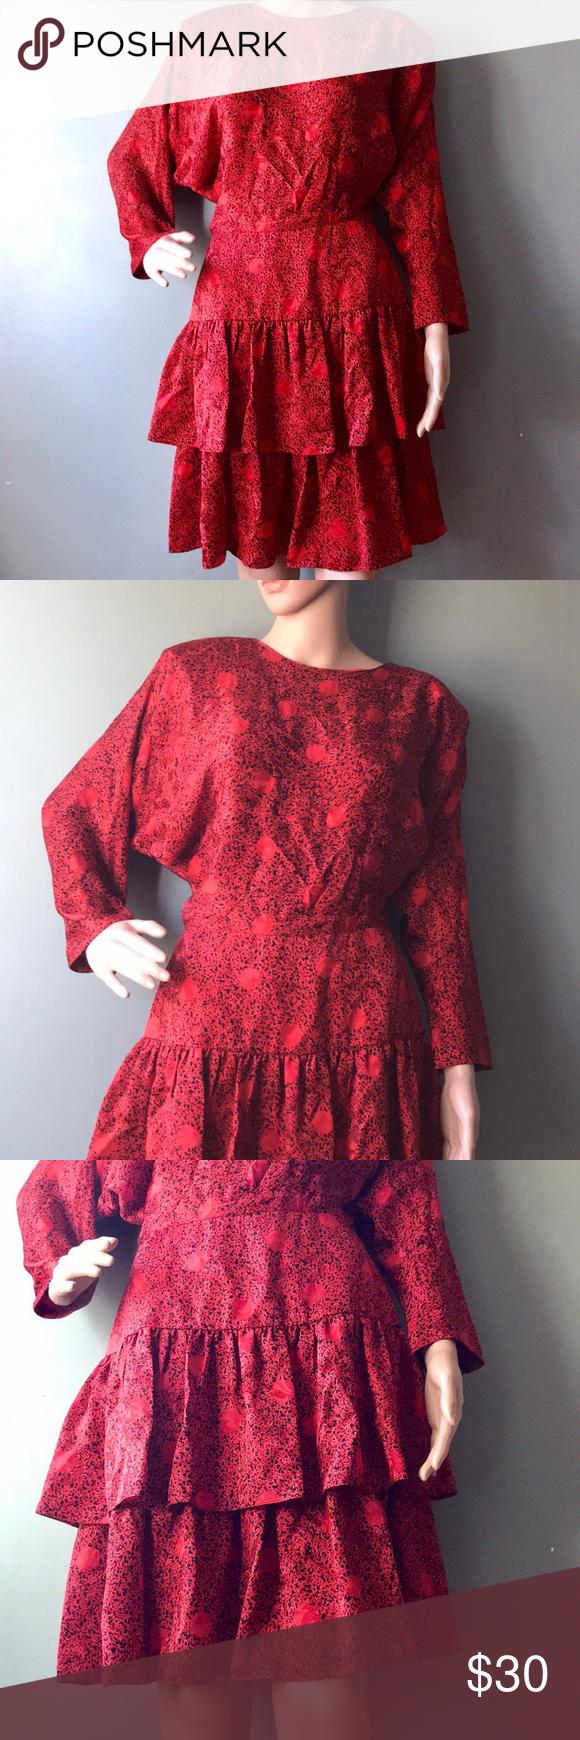 Vintage 80s Silk Ruffle Dress Dresses Ruffle Dress Vintage Dresses [ 1740 x 580 Pixel ]